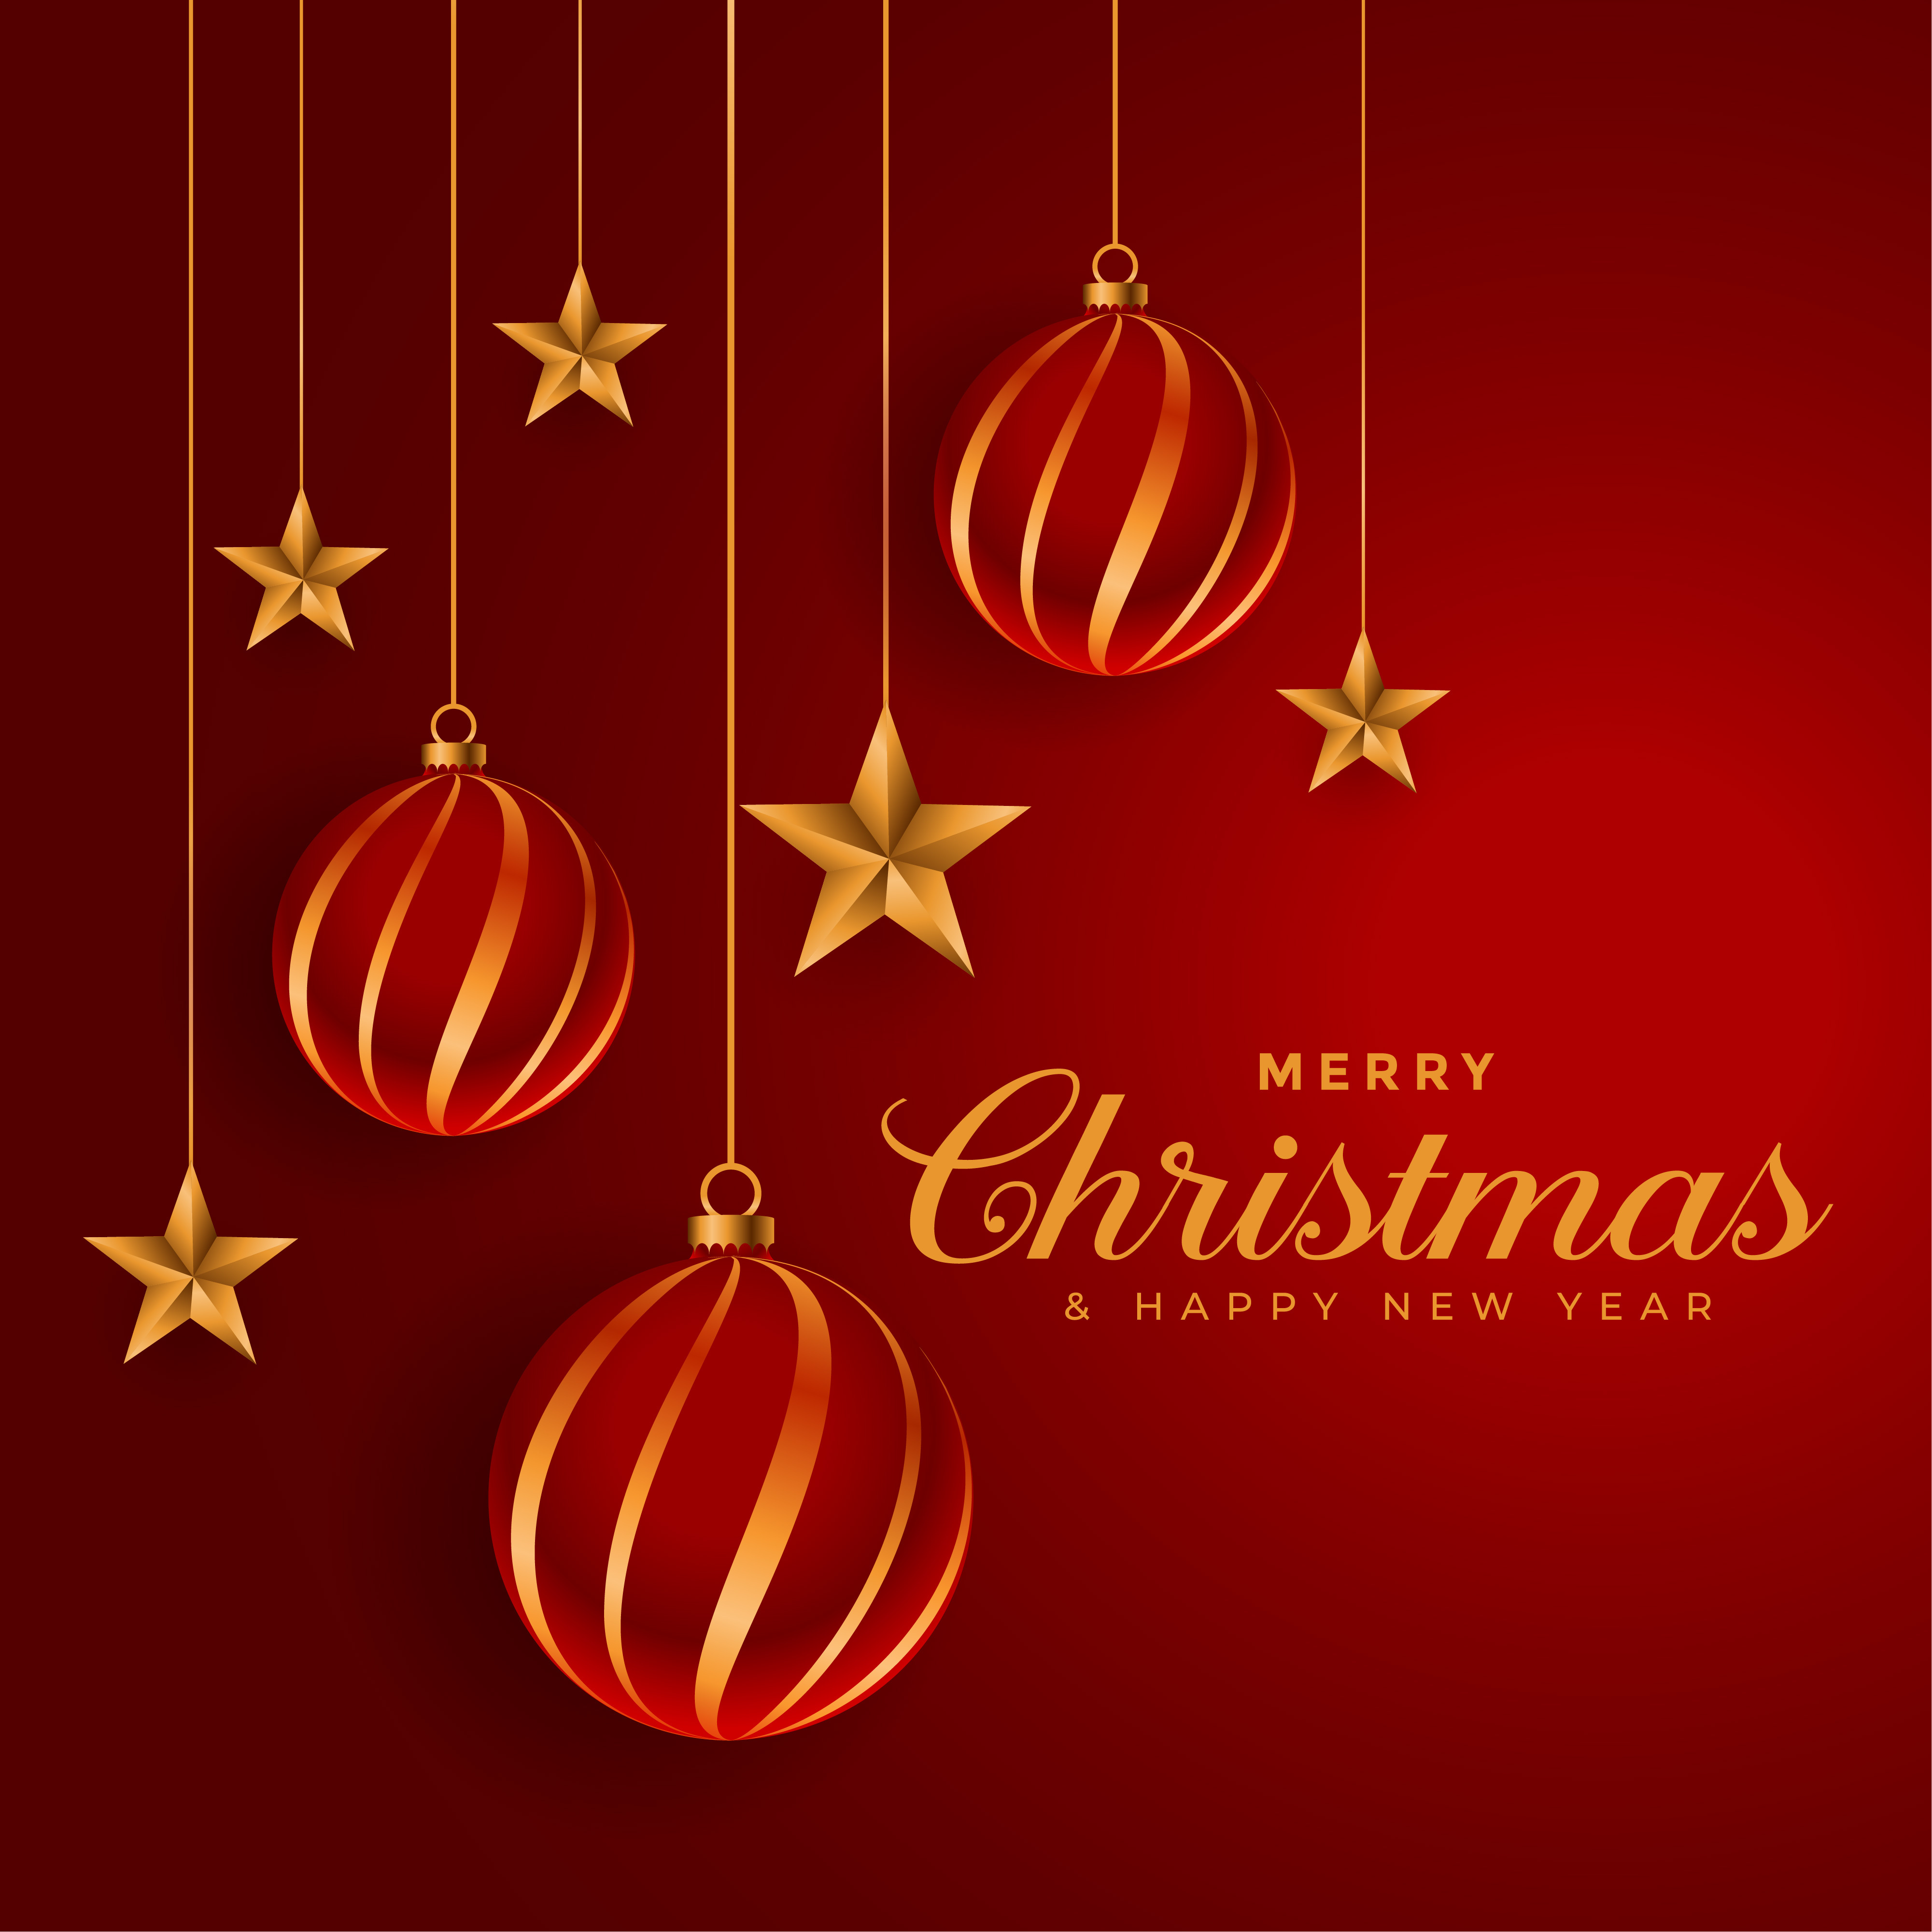 christmas balls and golden stars decorative festival background